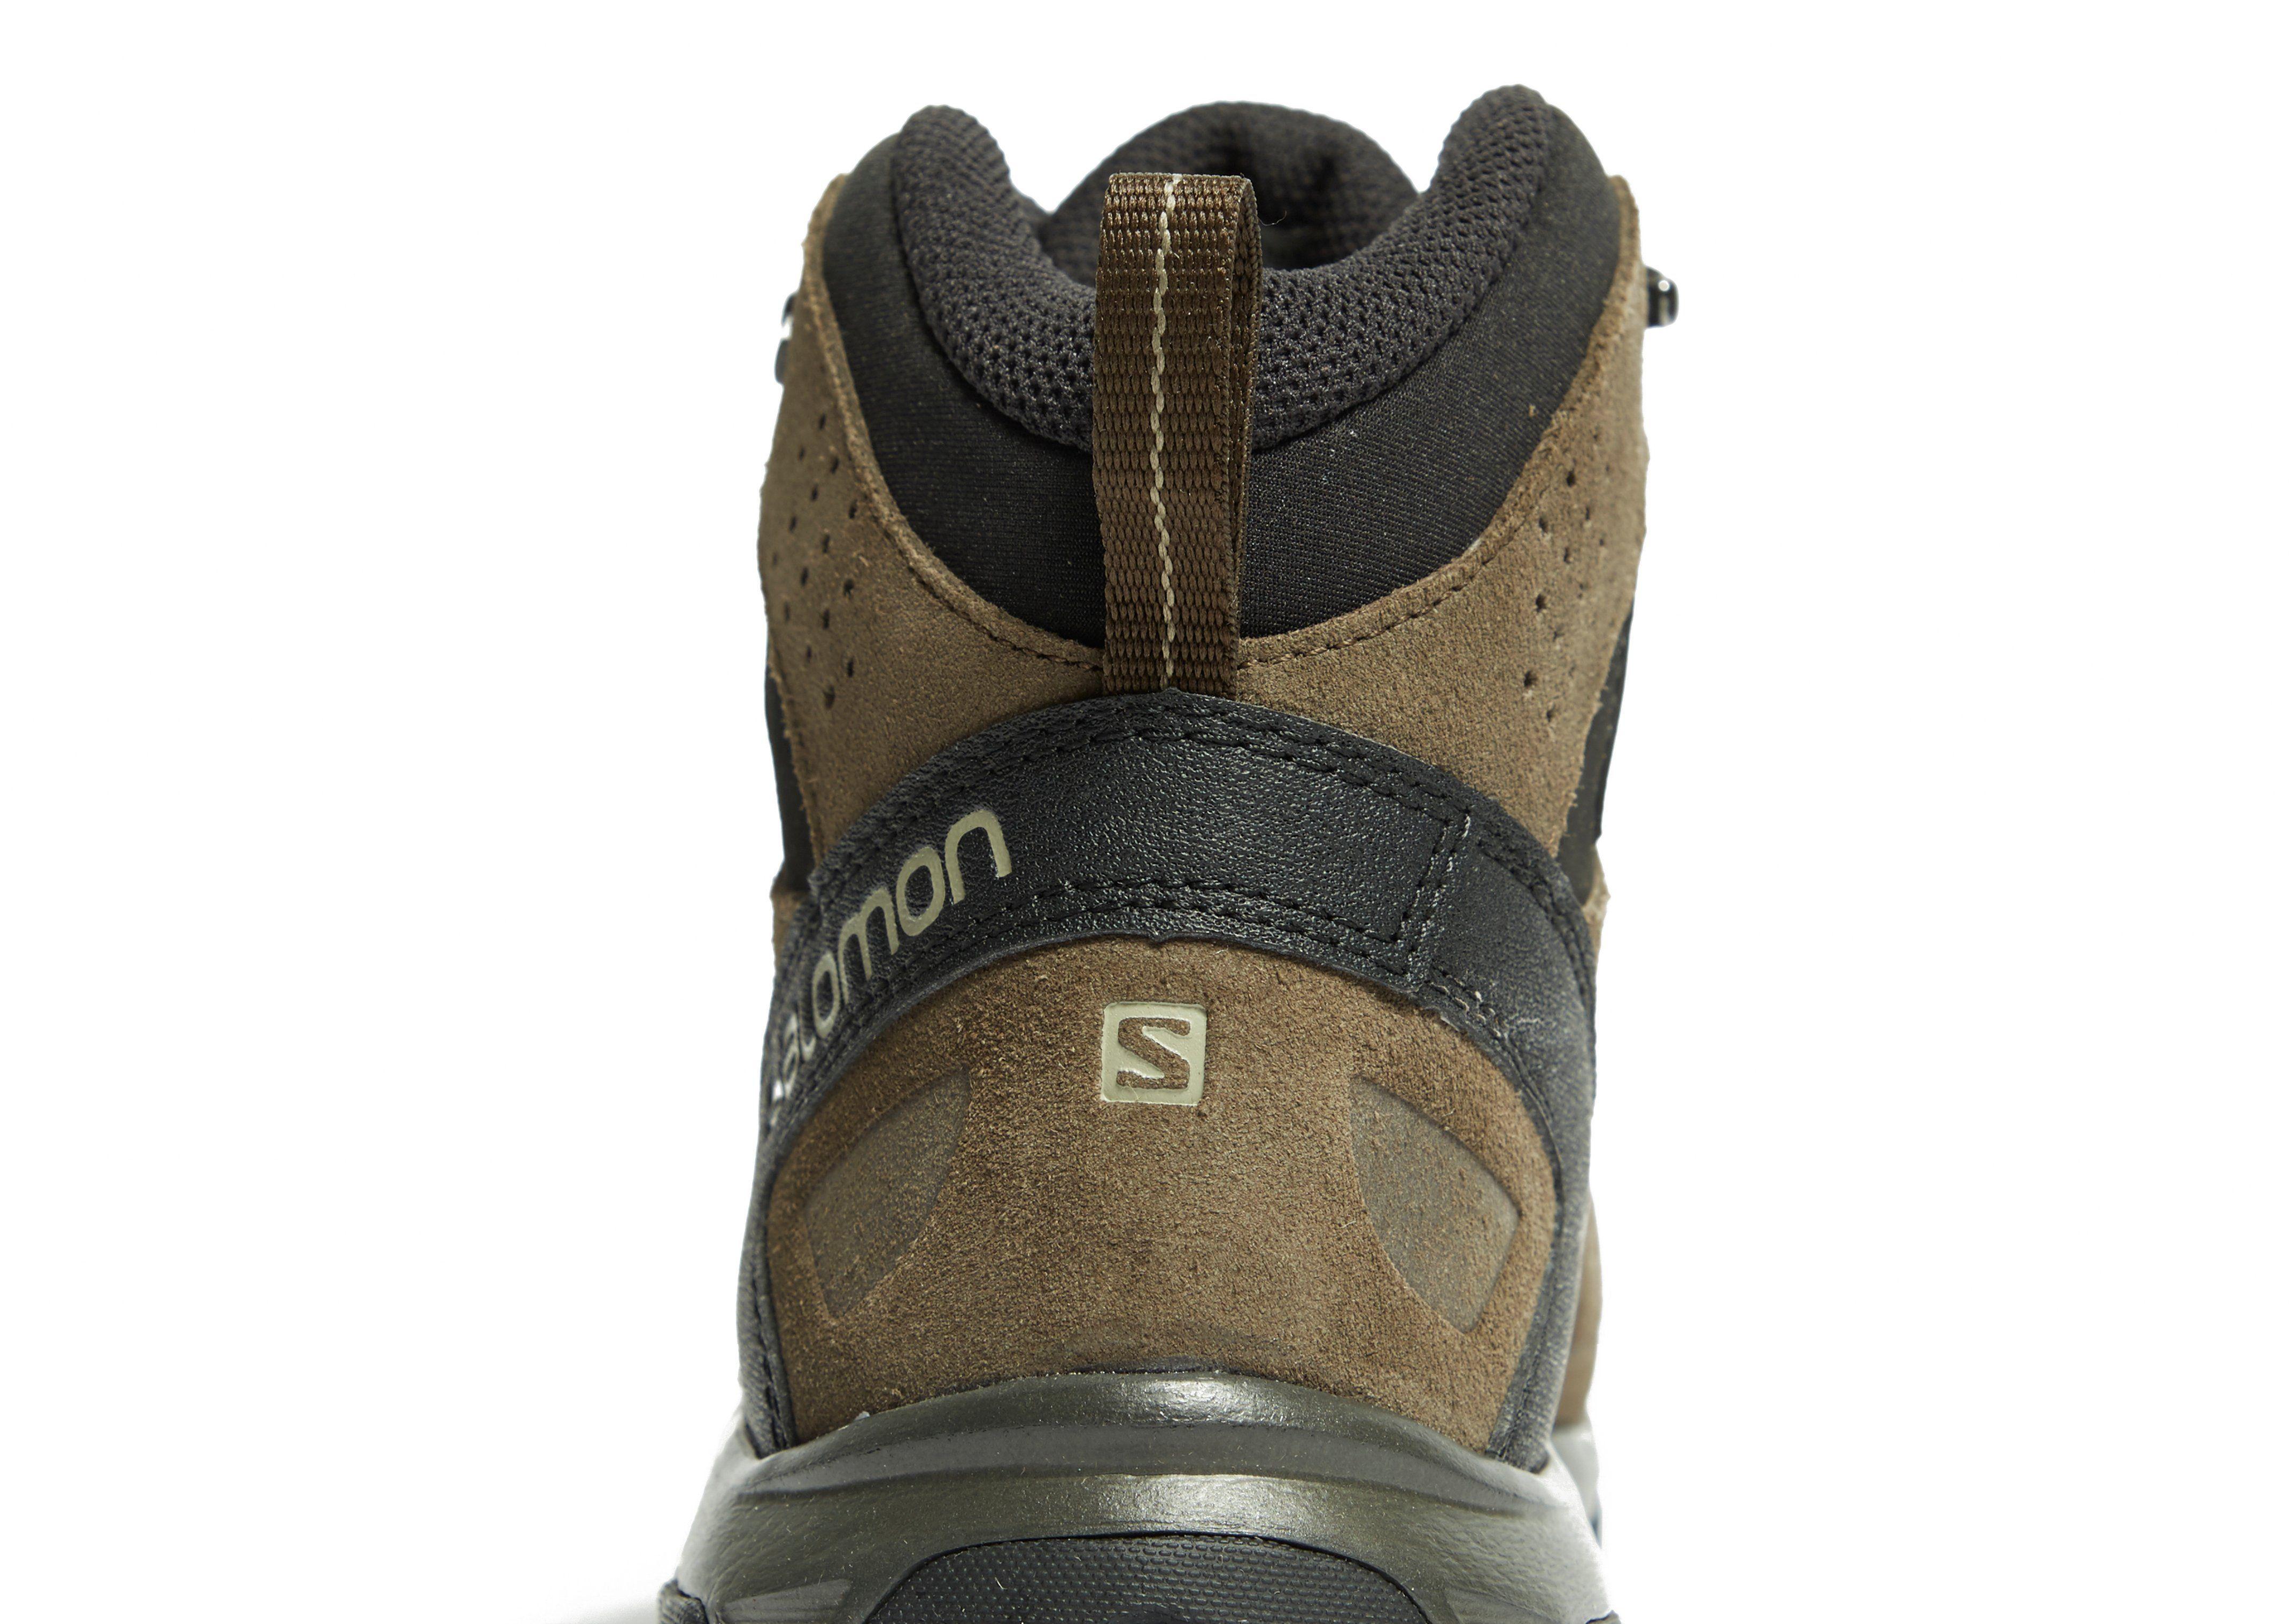 Salomon Evasion 2 Mid Leather Hiking Boots